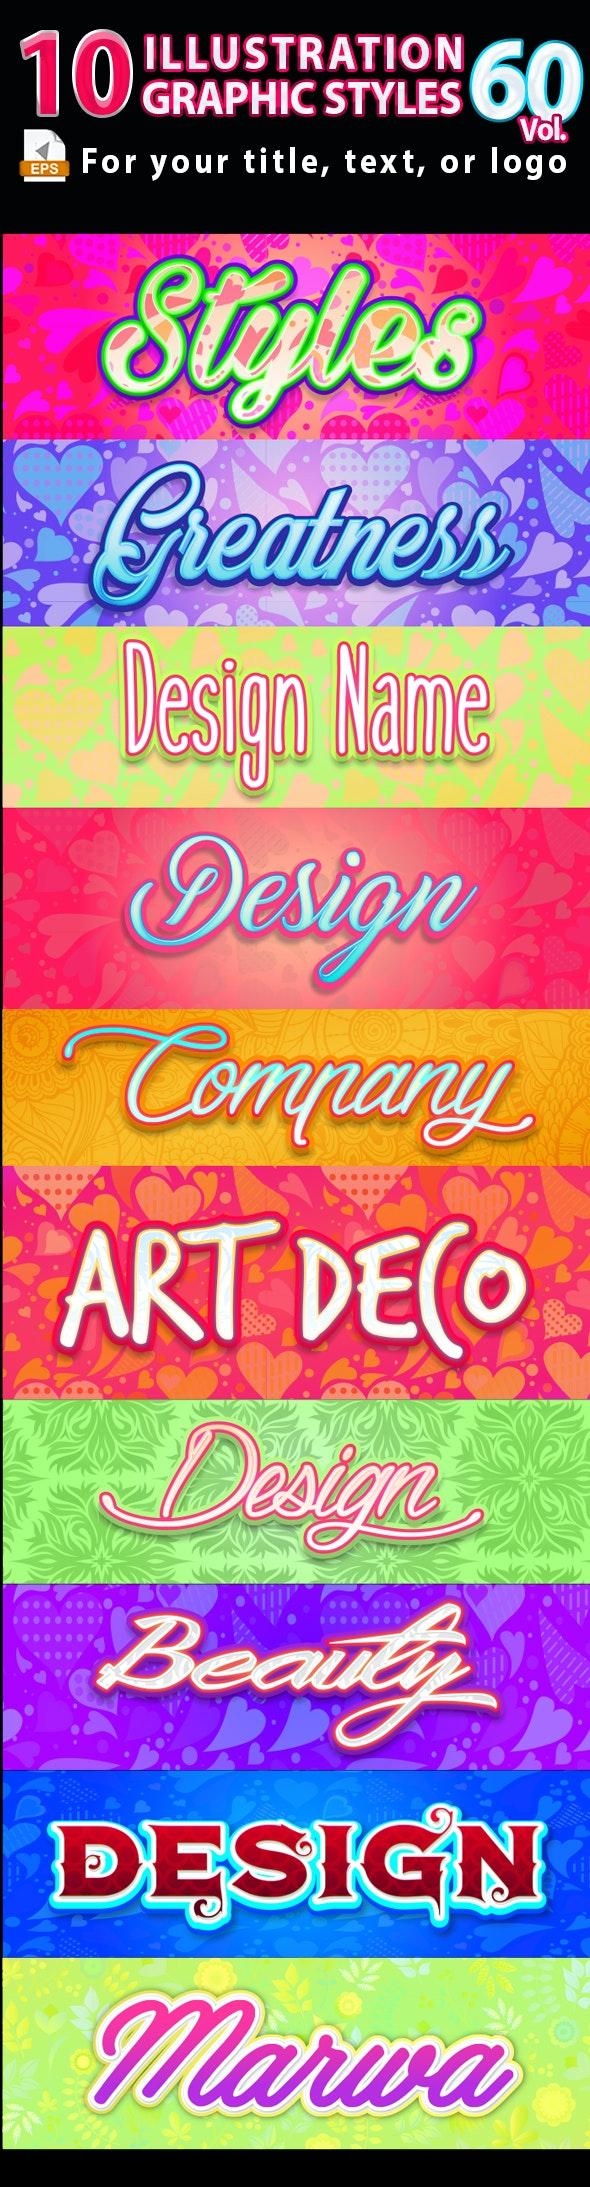 10 Illustrator Graphic Styles Vol.60 - Styles Illustrator